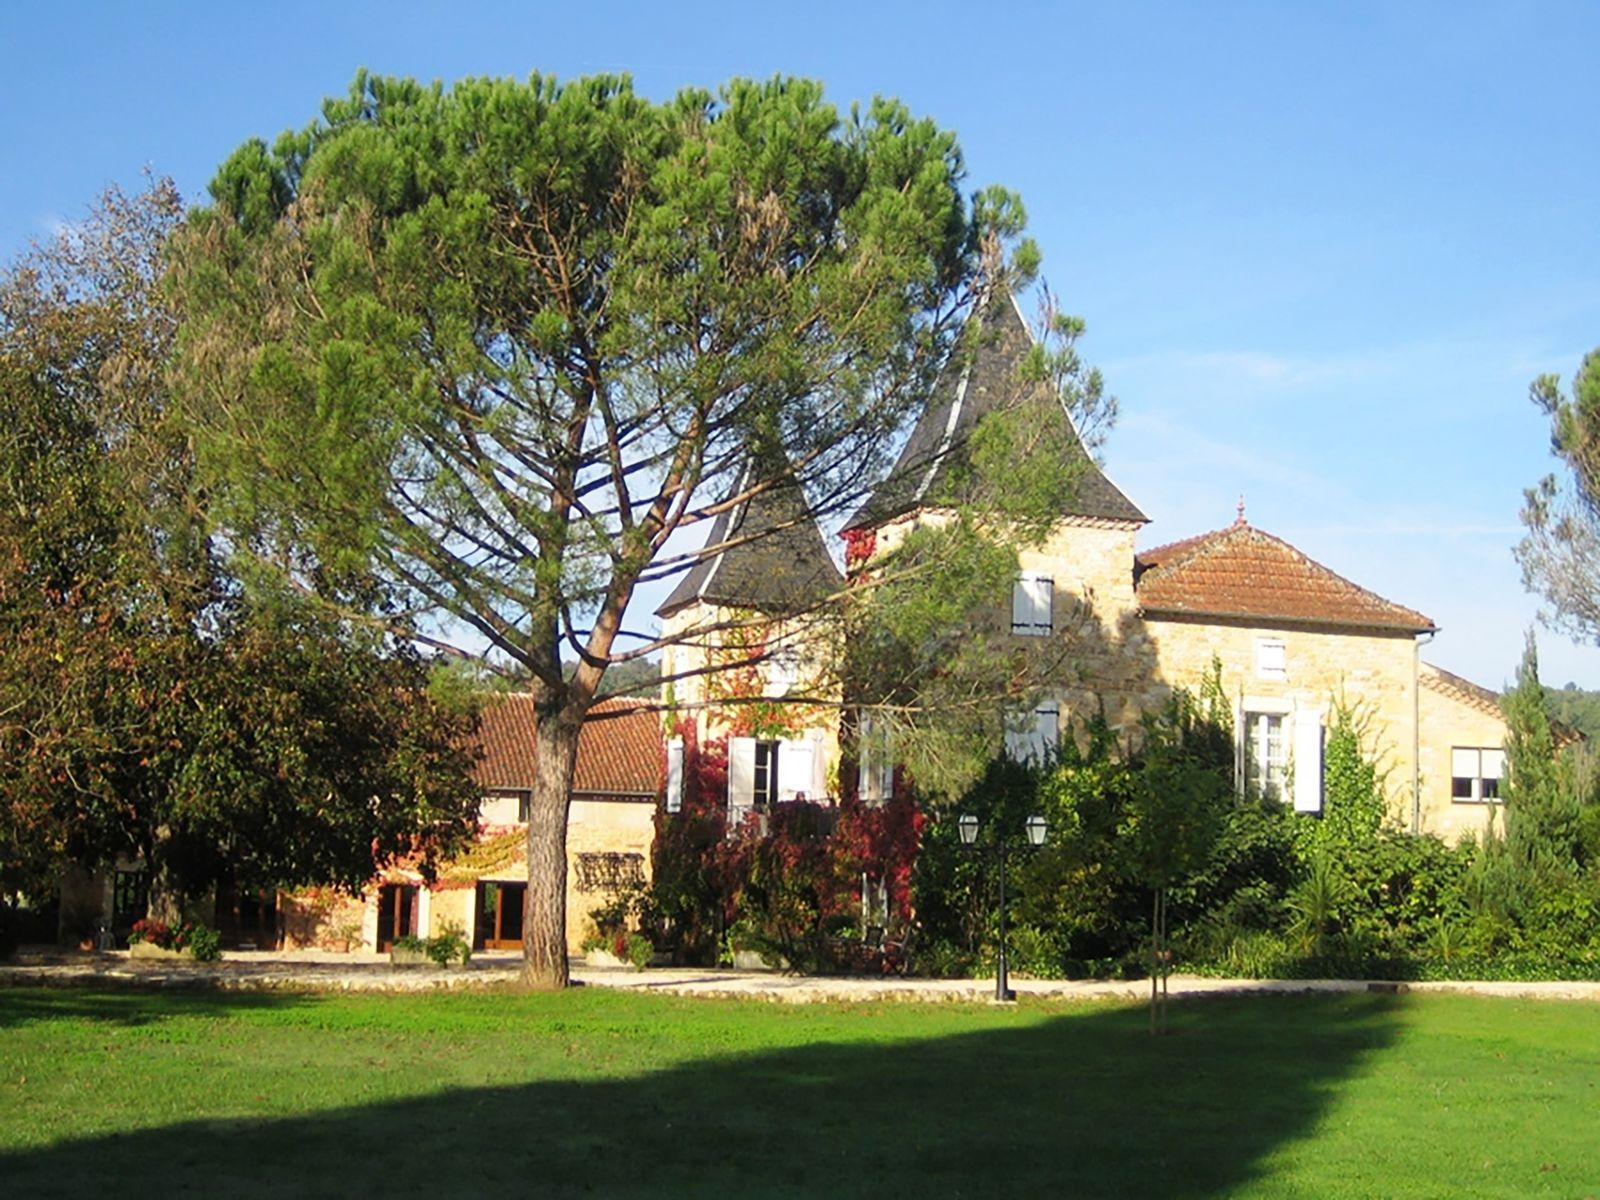 Afbeelding van Chateau Prayssac - B vakantiehuis in Dordogne, Frankrijk